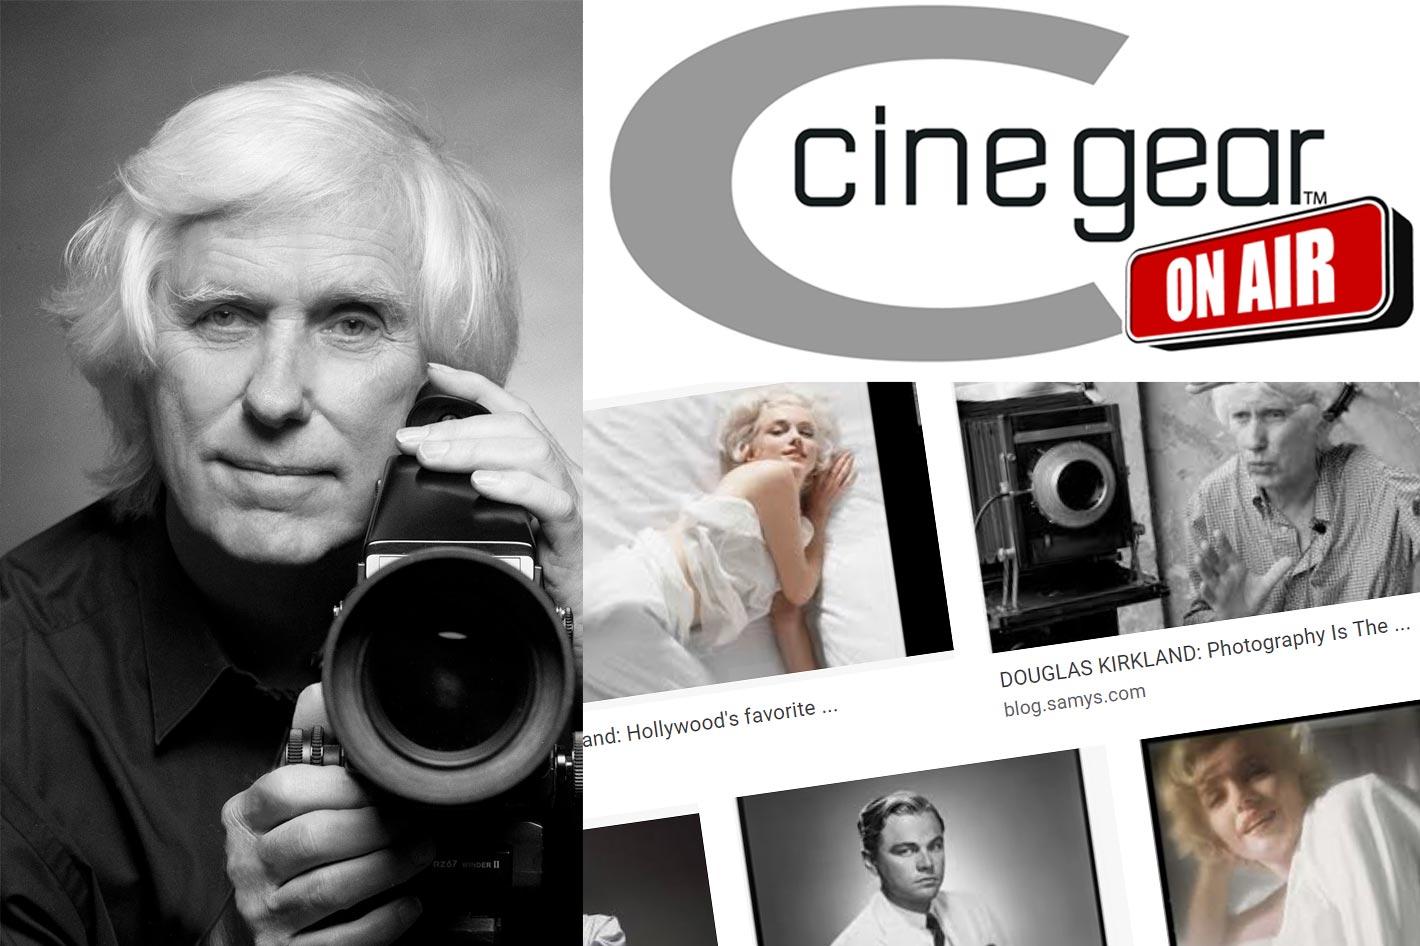 CineGear ON Air: a tribute to Douglas Kirkland